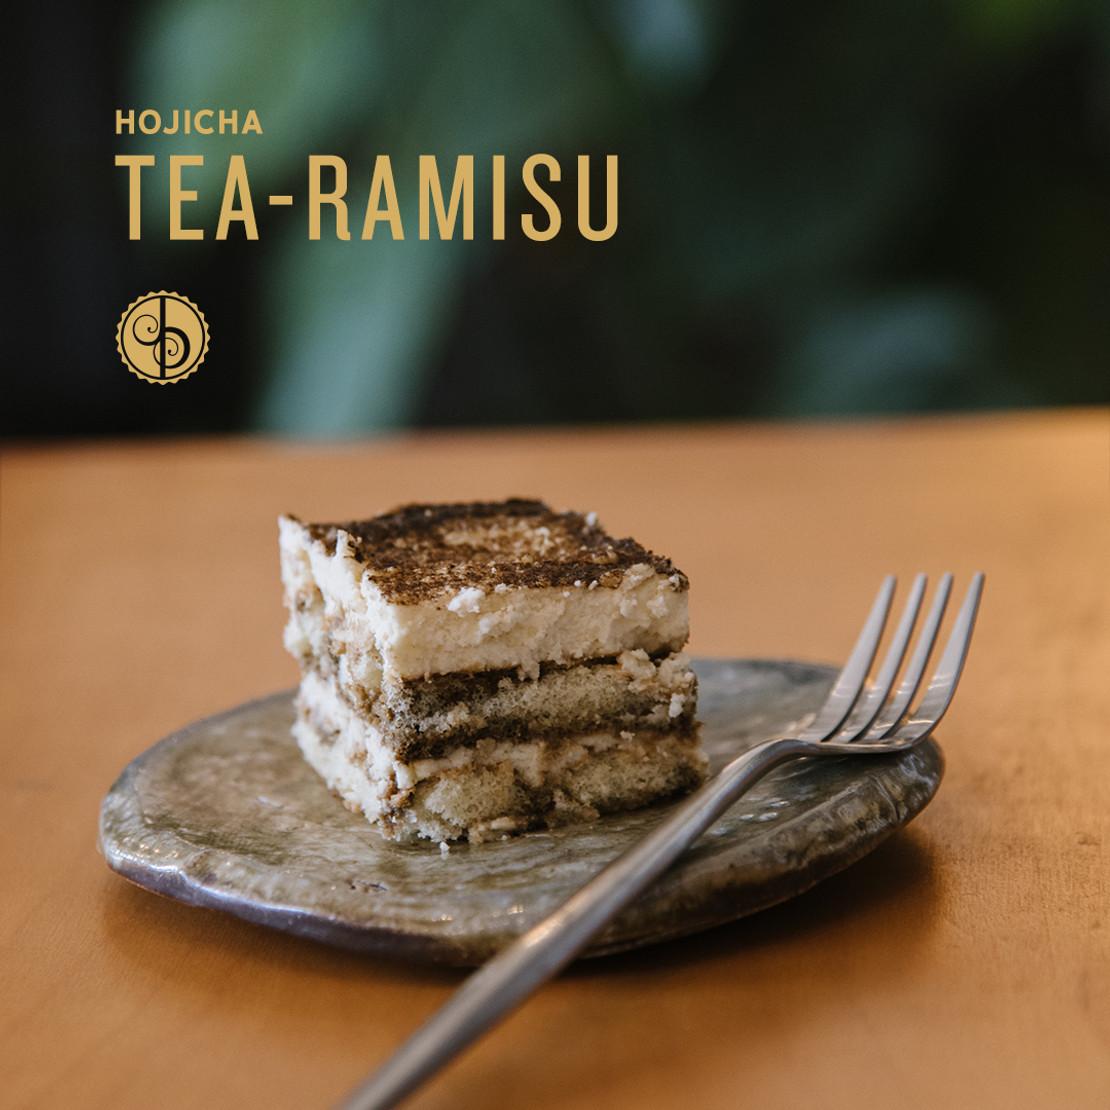 Hojicha Latte Tea-Ramisu